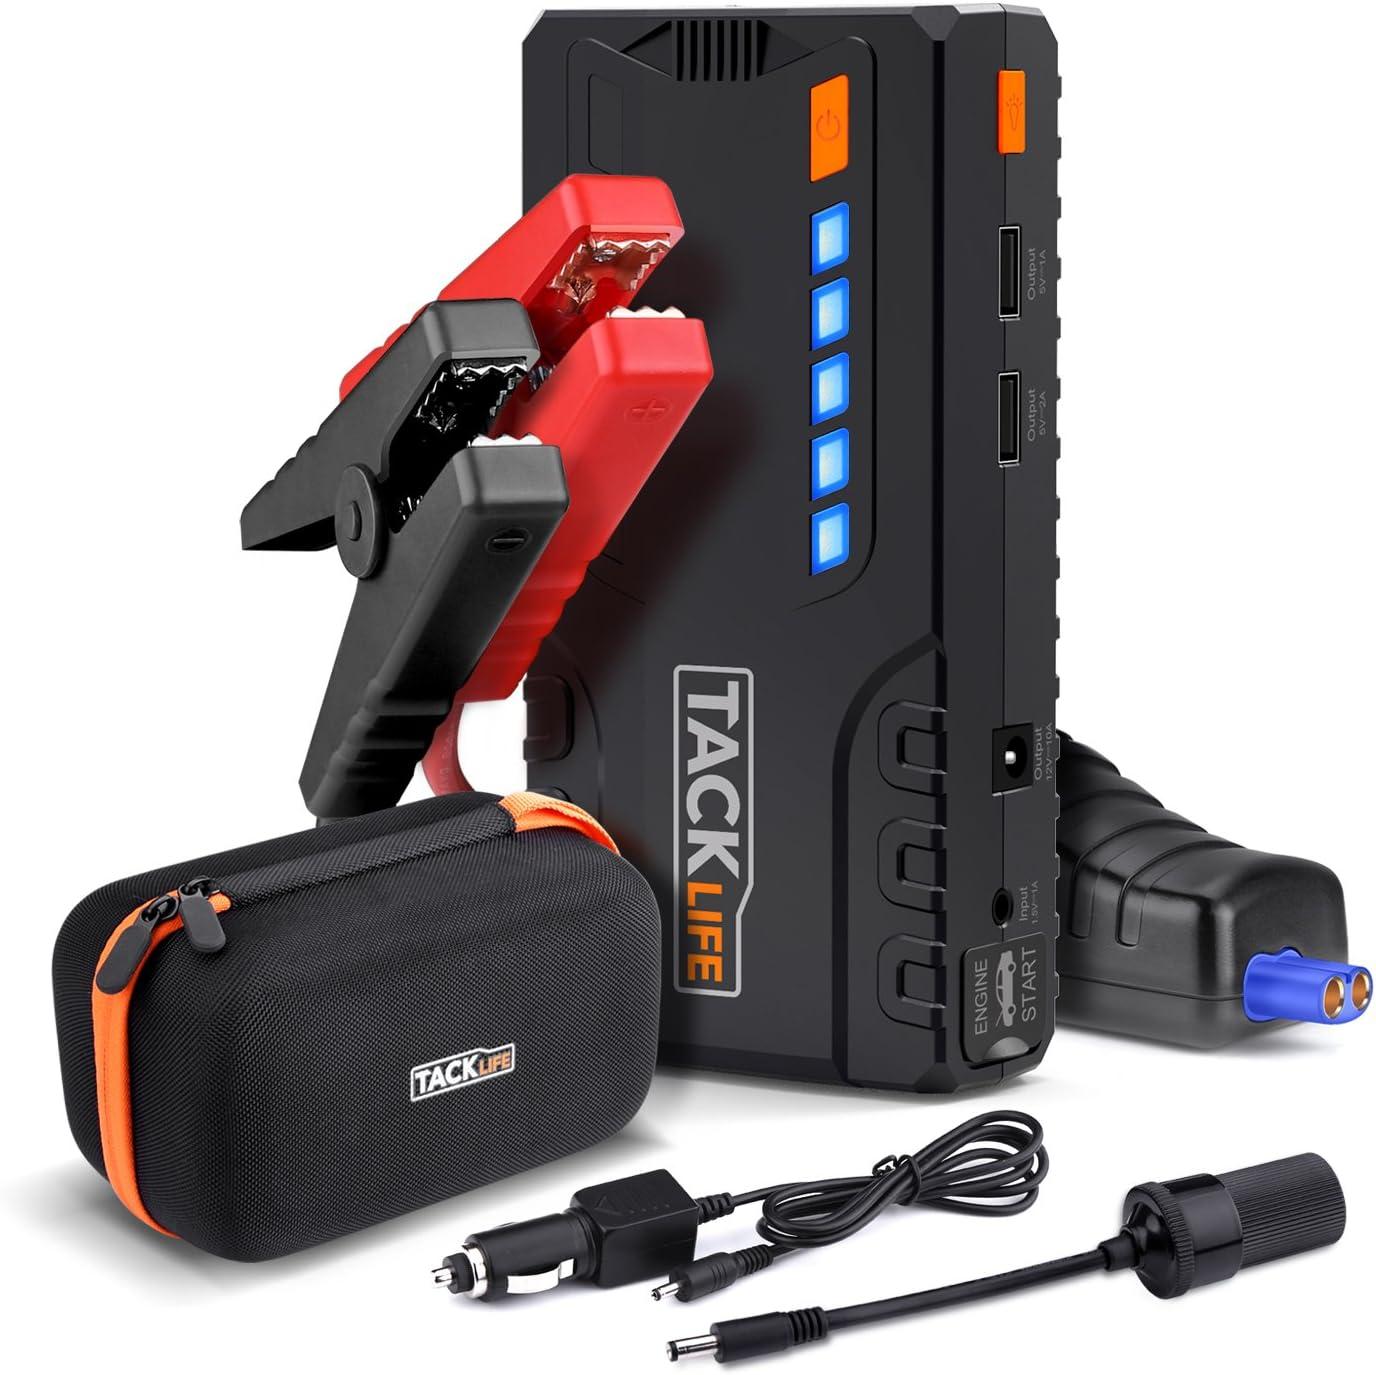 Jusqu/' D/émarrage de Voiture TACKLIFE T6 Booster Batterie 600A 16500mAh Portable Jump Starter